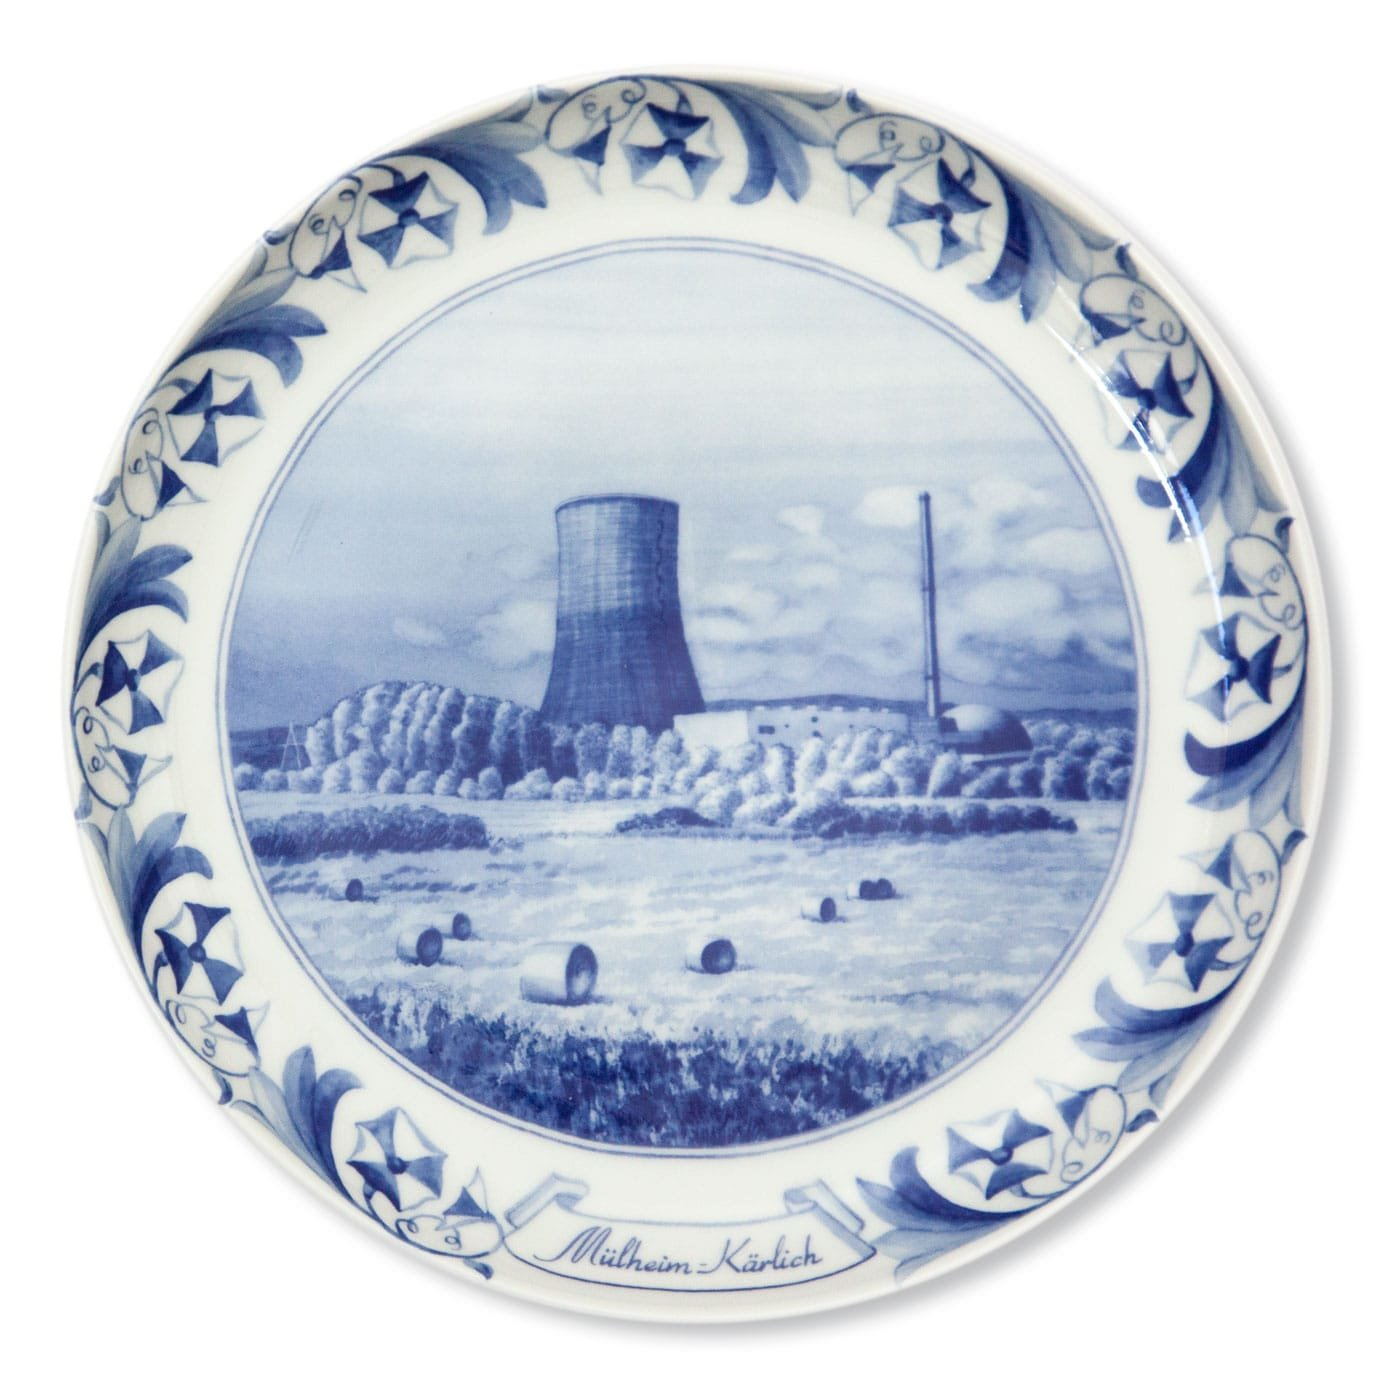 porcelain-nuclear-reactors-plates-mulheim-karlich